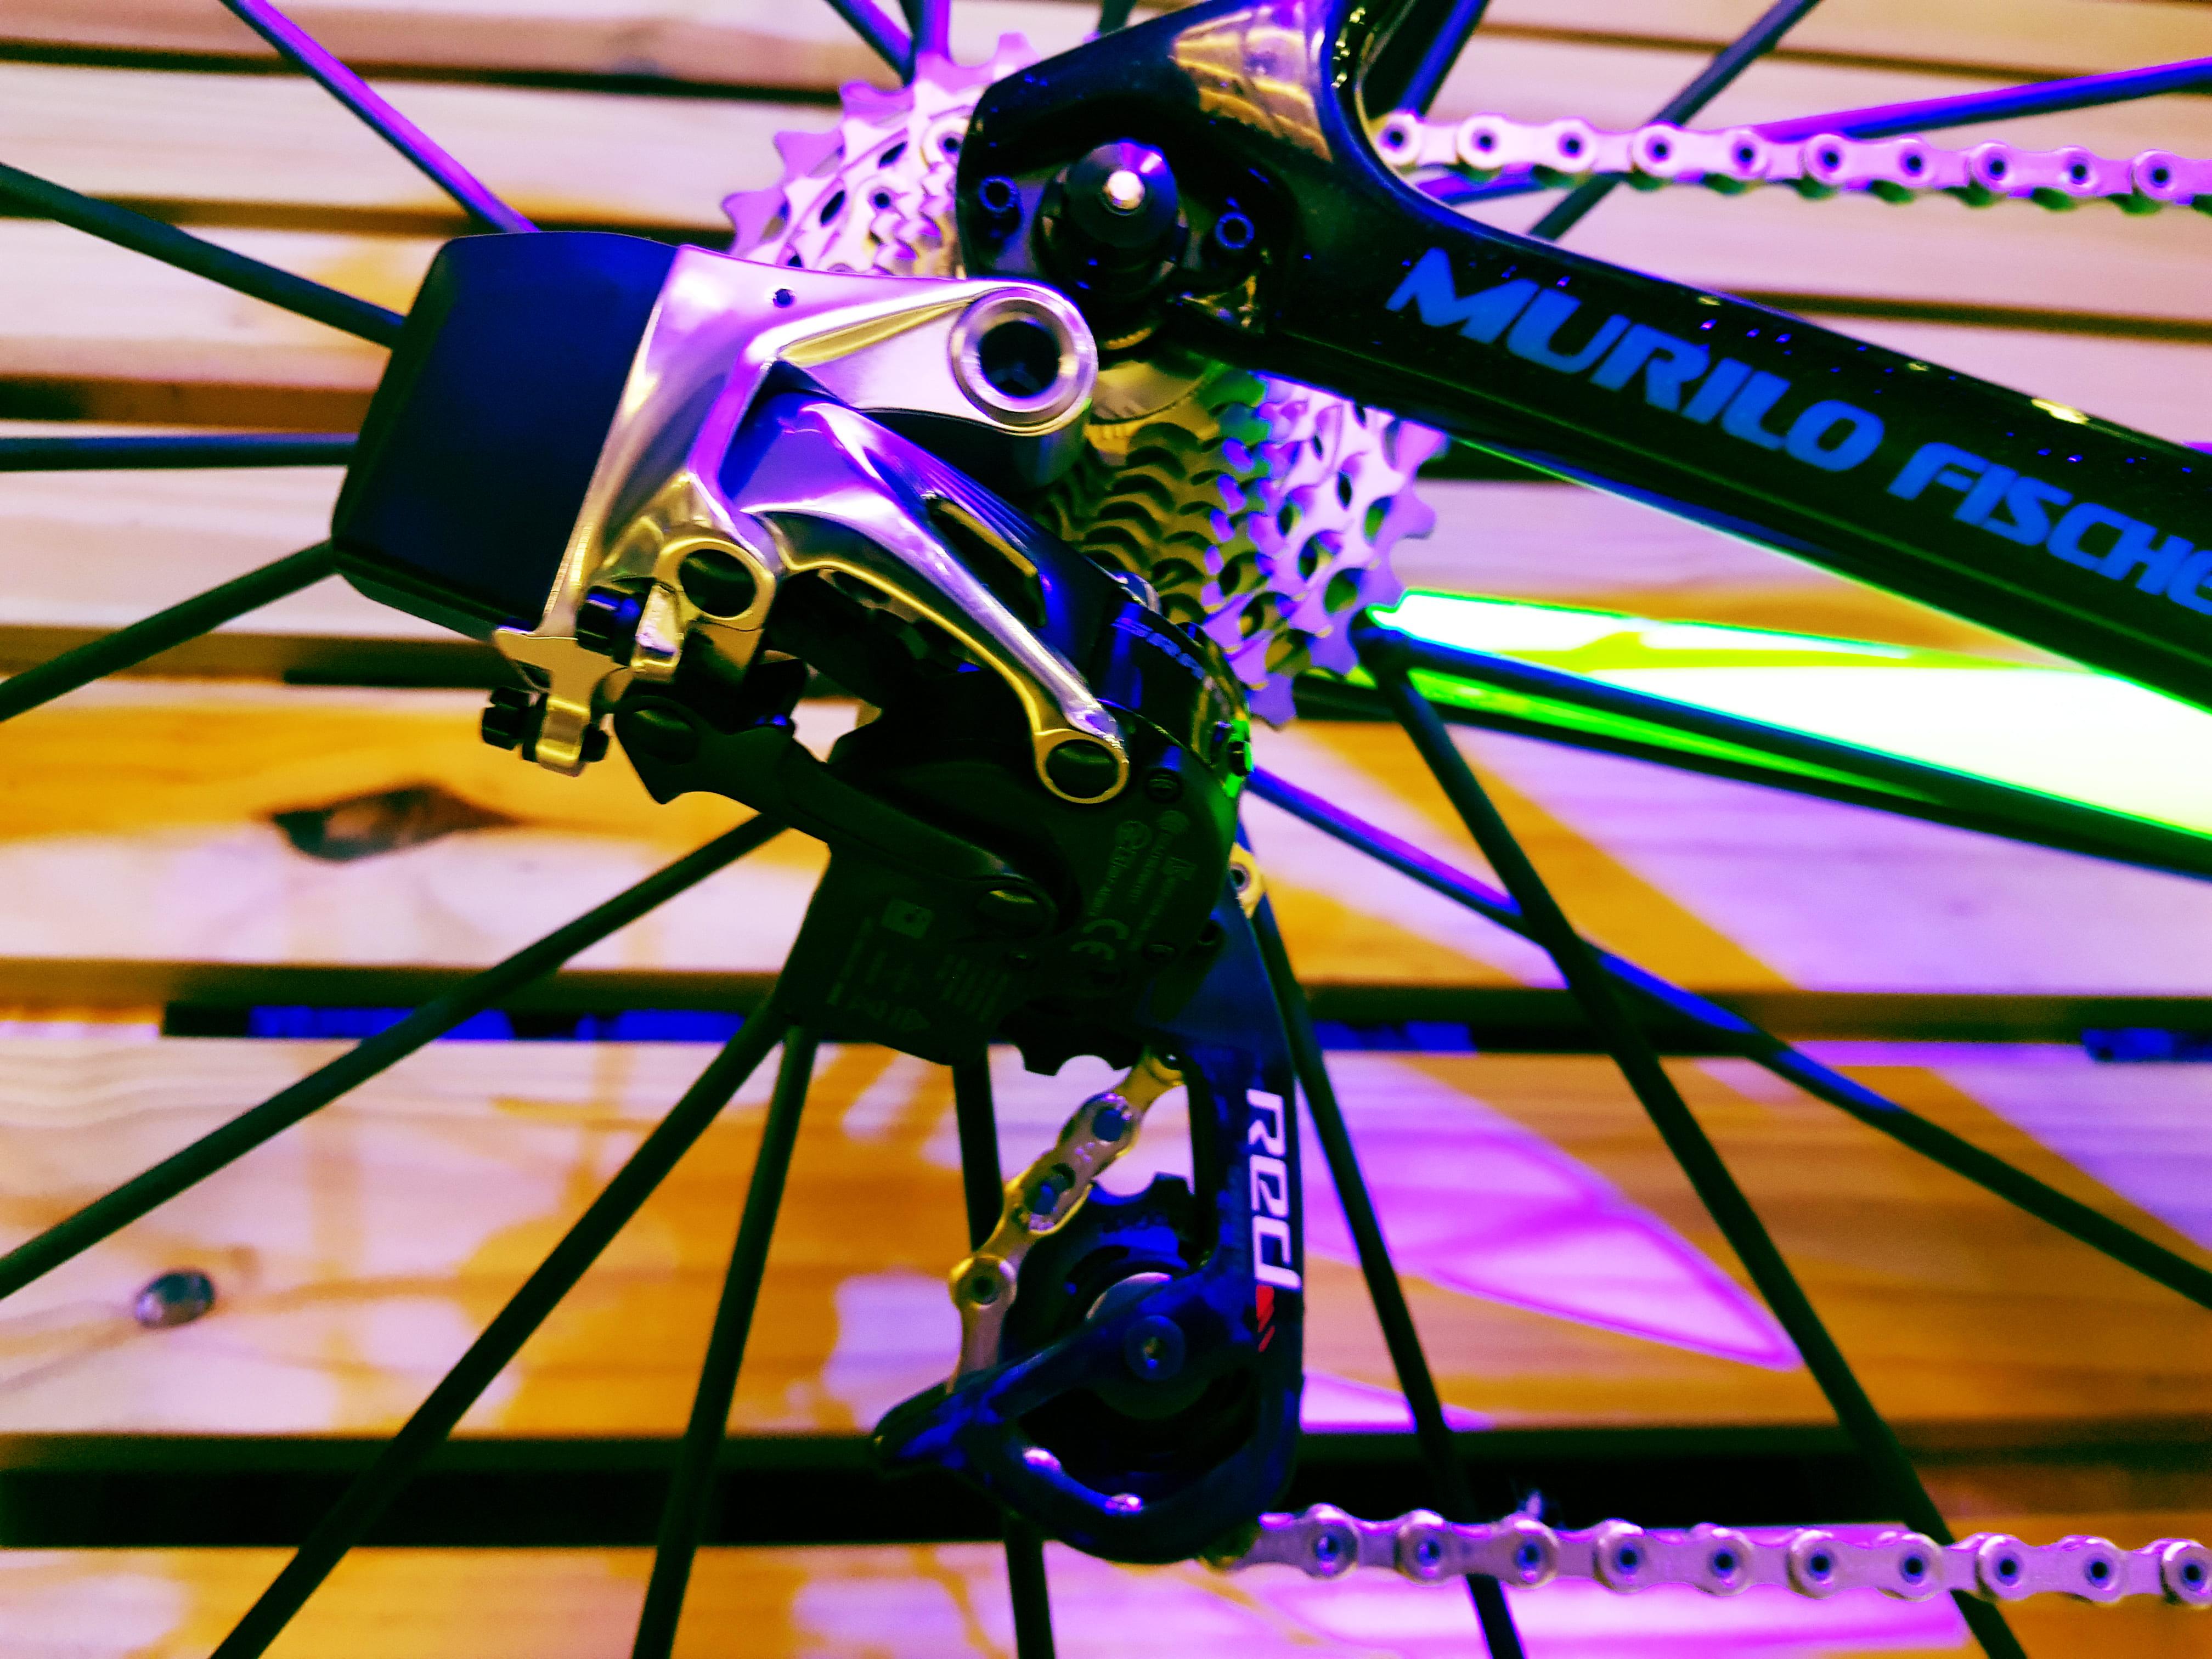 Detalhe da corrente da bicicleta Murilo Fischer Limited Edition